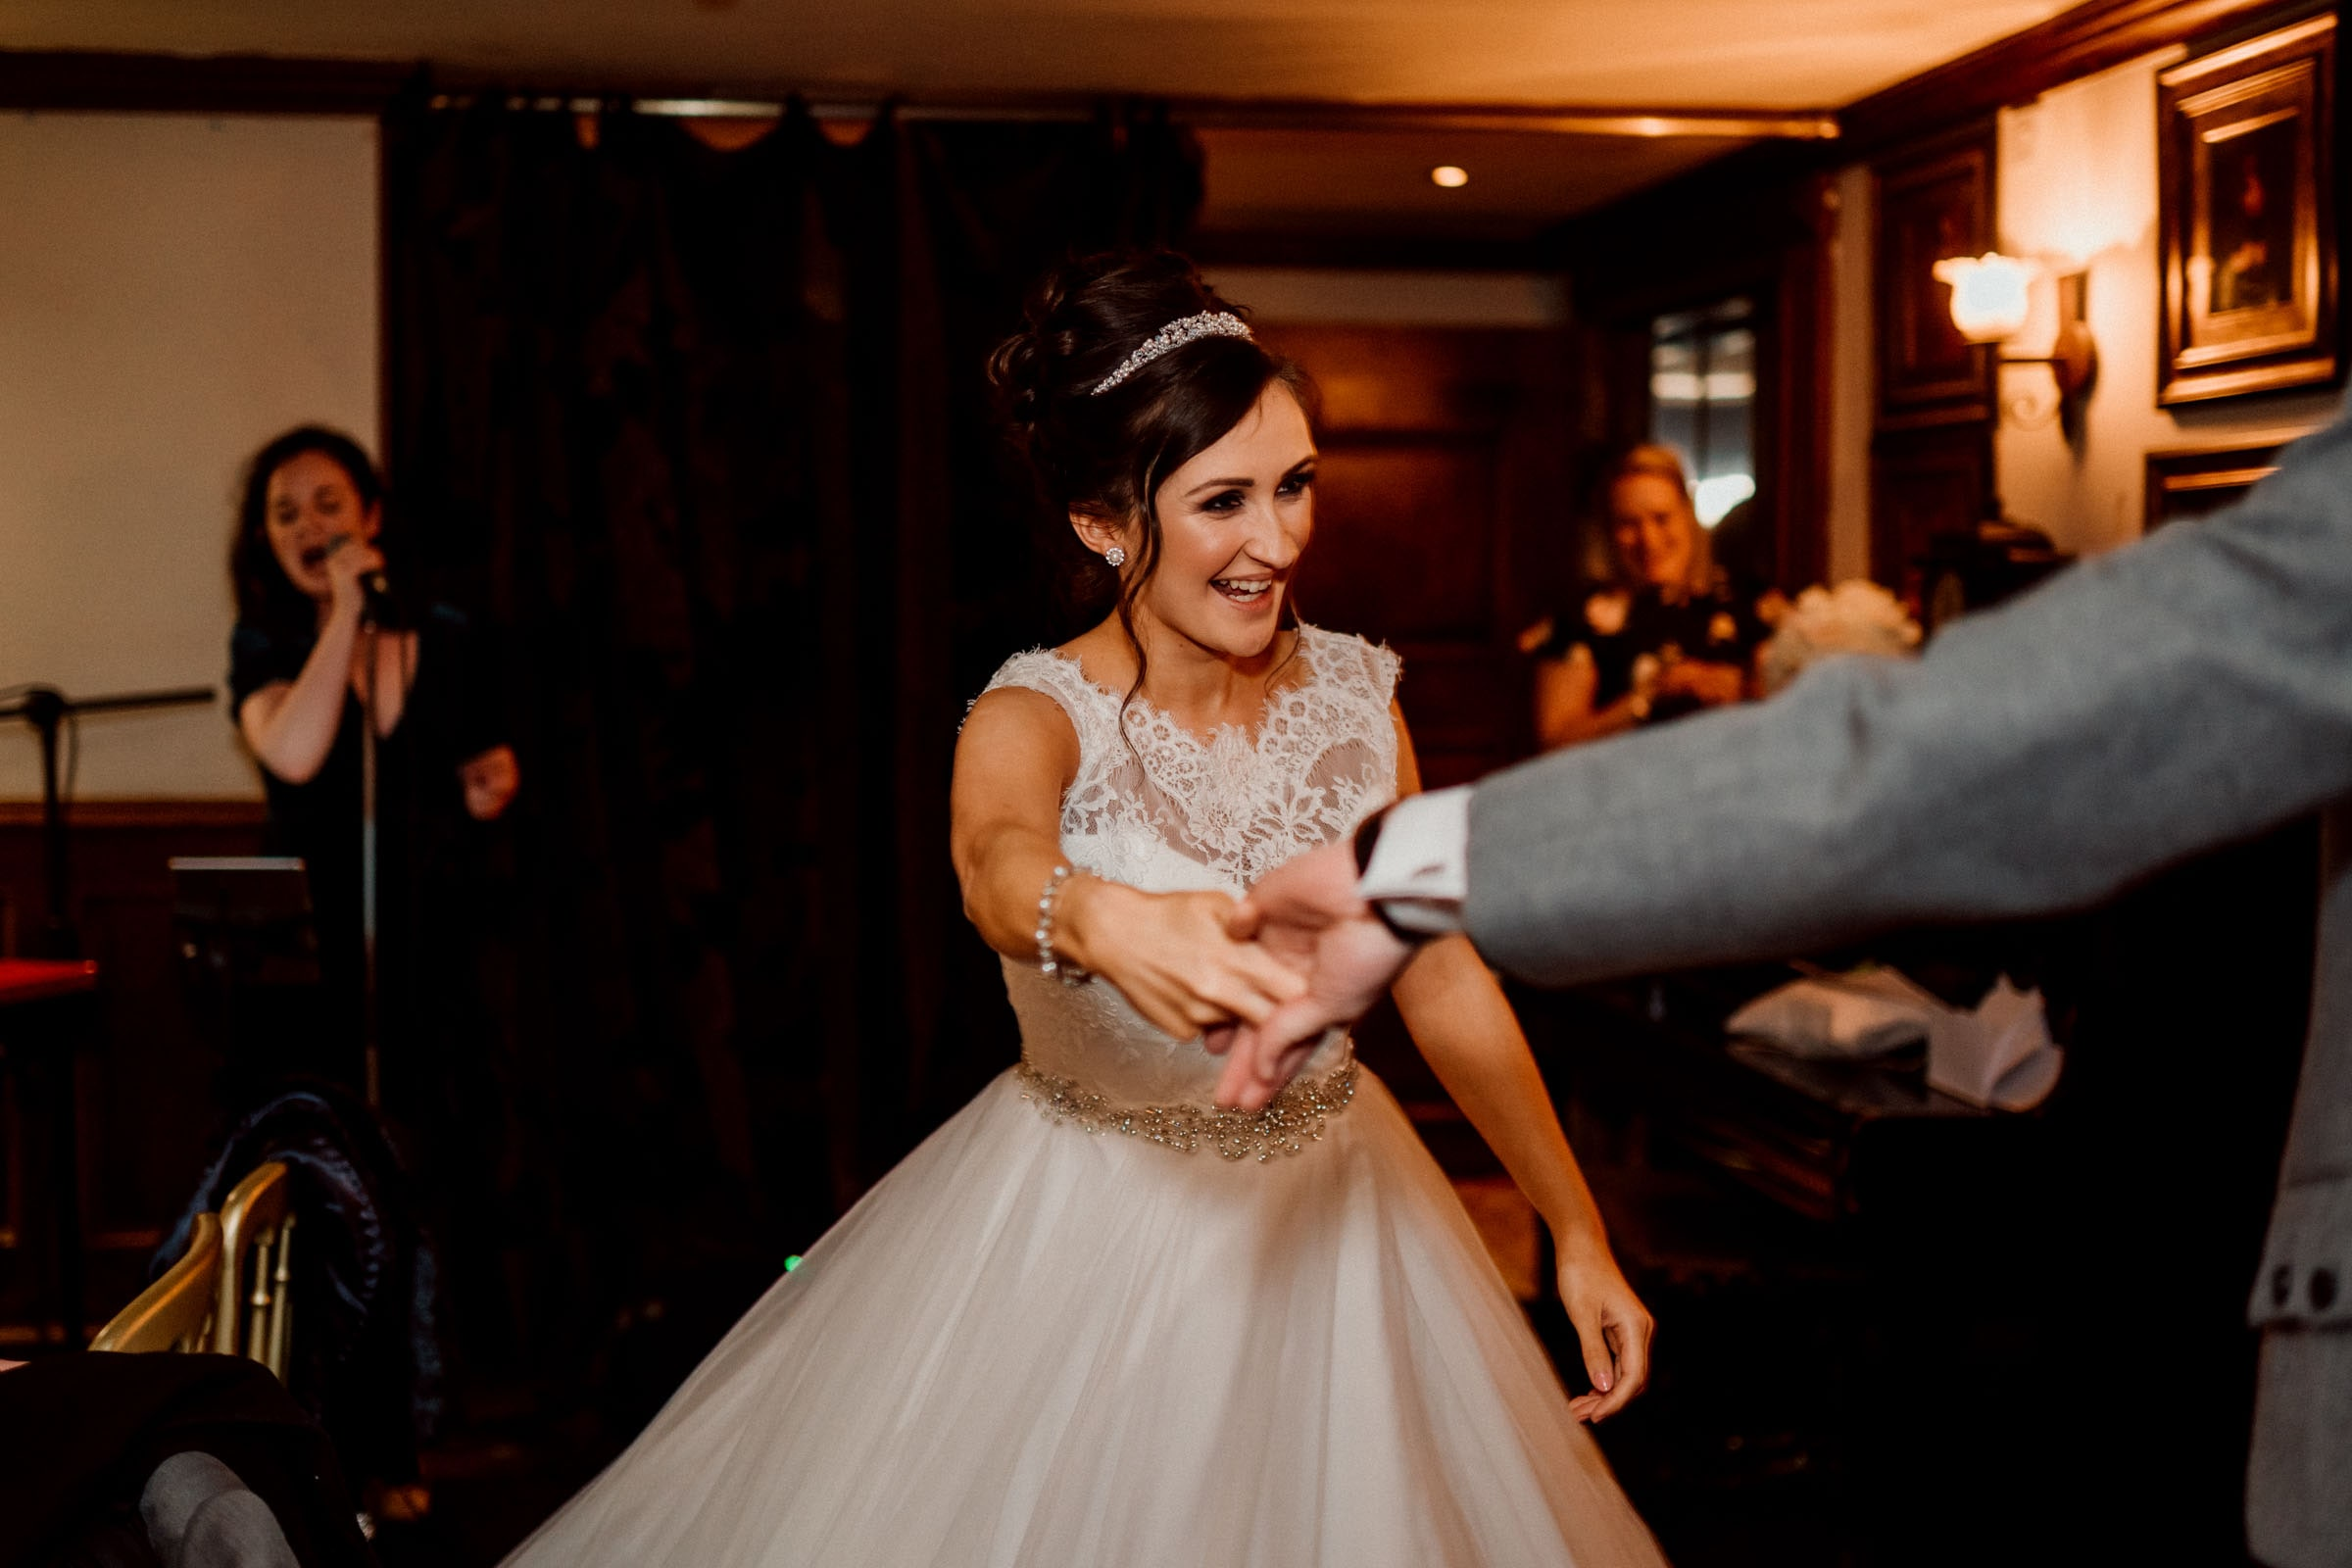 Oran-Mor-Wedding-Photographer-DearlyPhotography (47 of 55).jpg